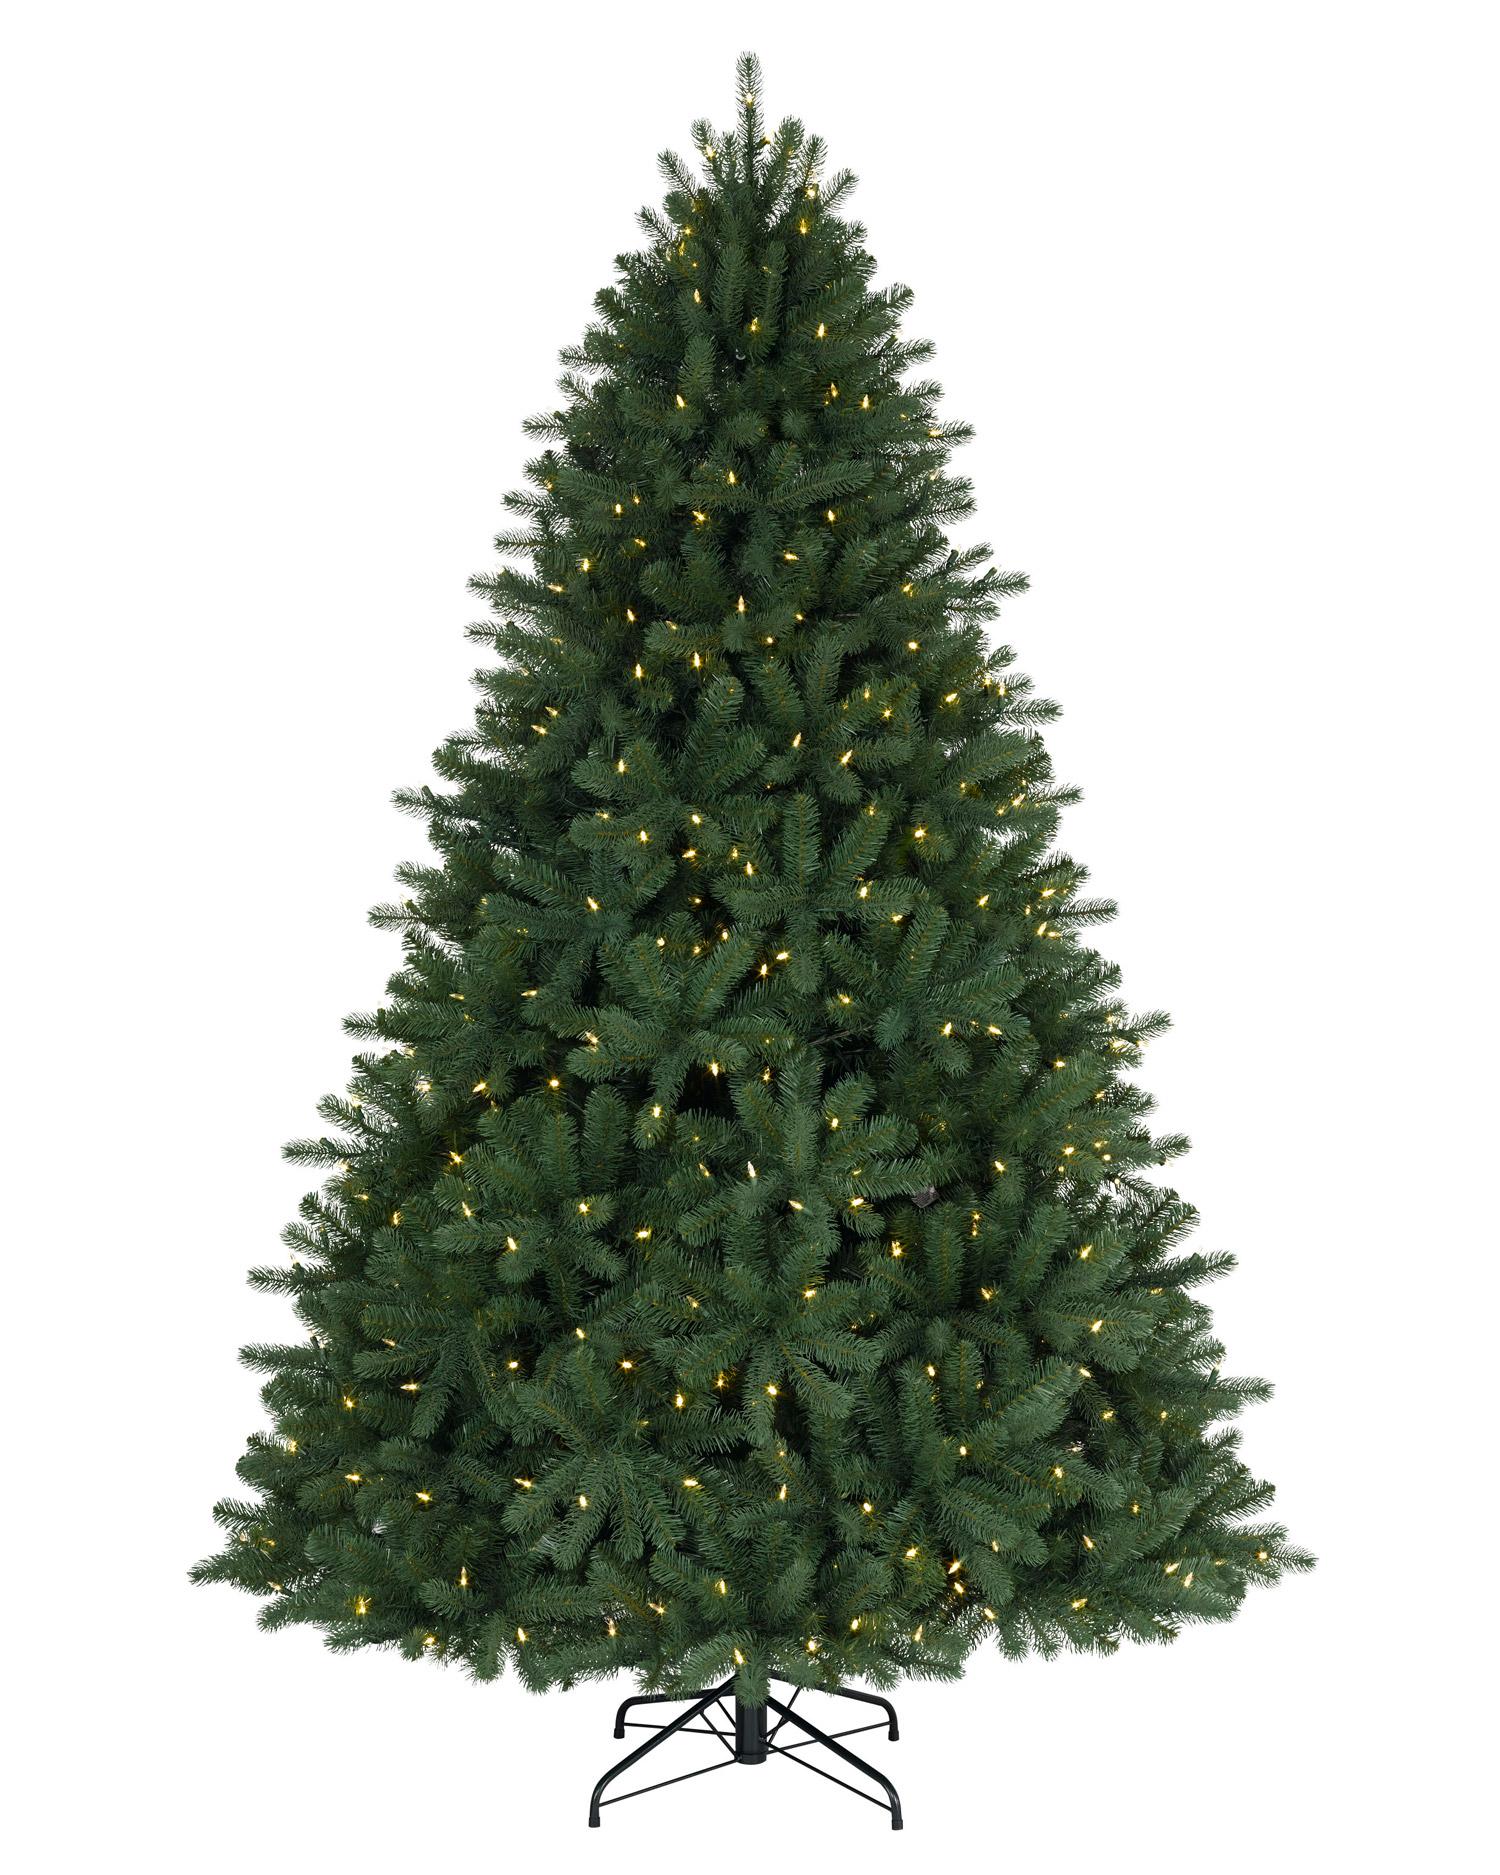 75 foot royal douglas fir clear led christmas tree - 2 Ft Christmas Tree